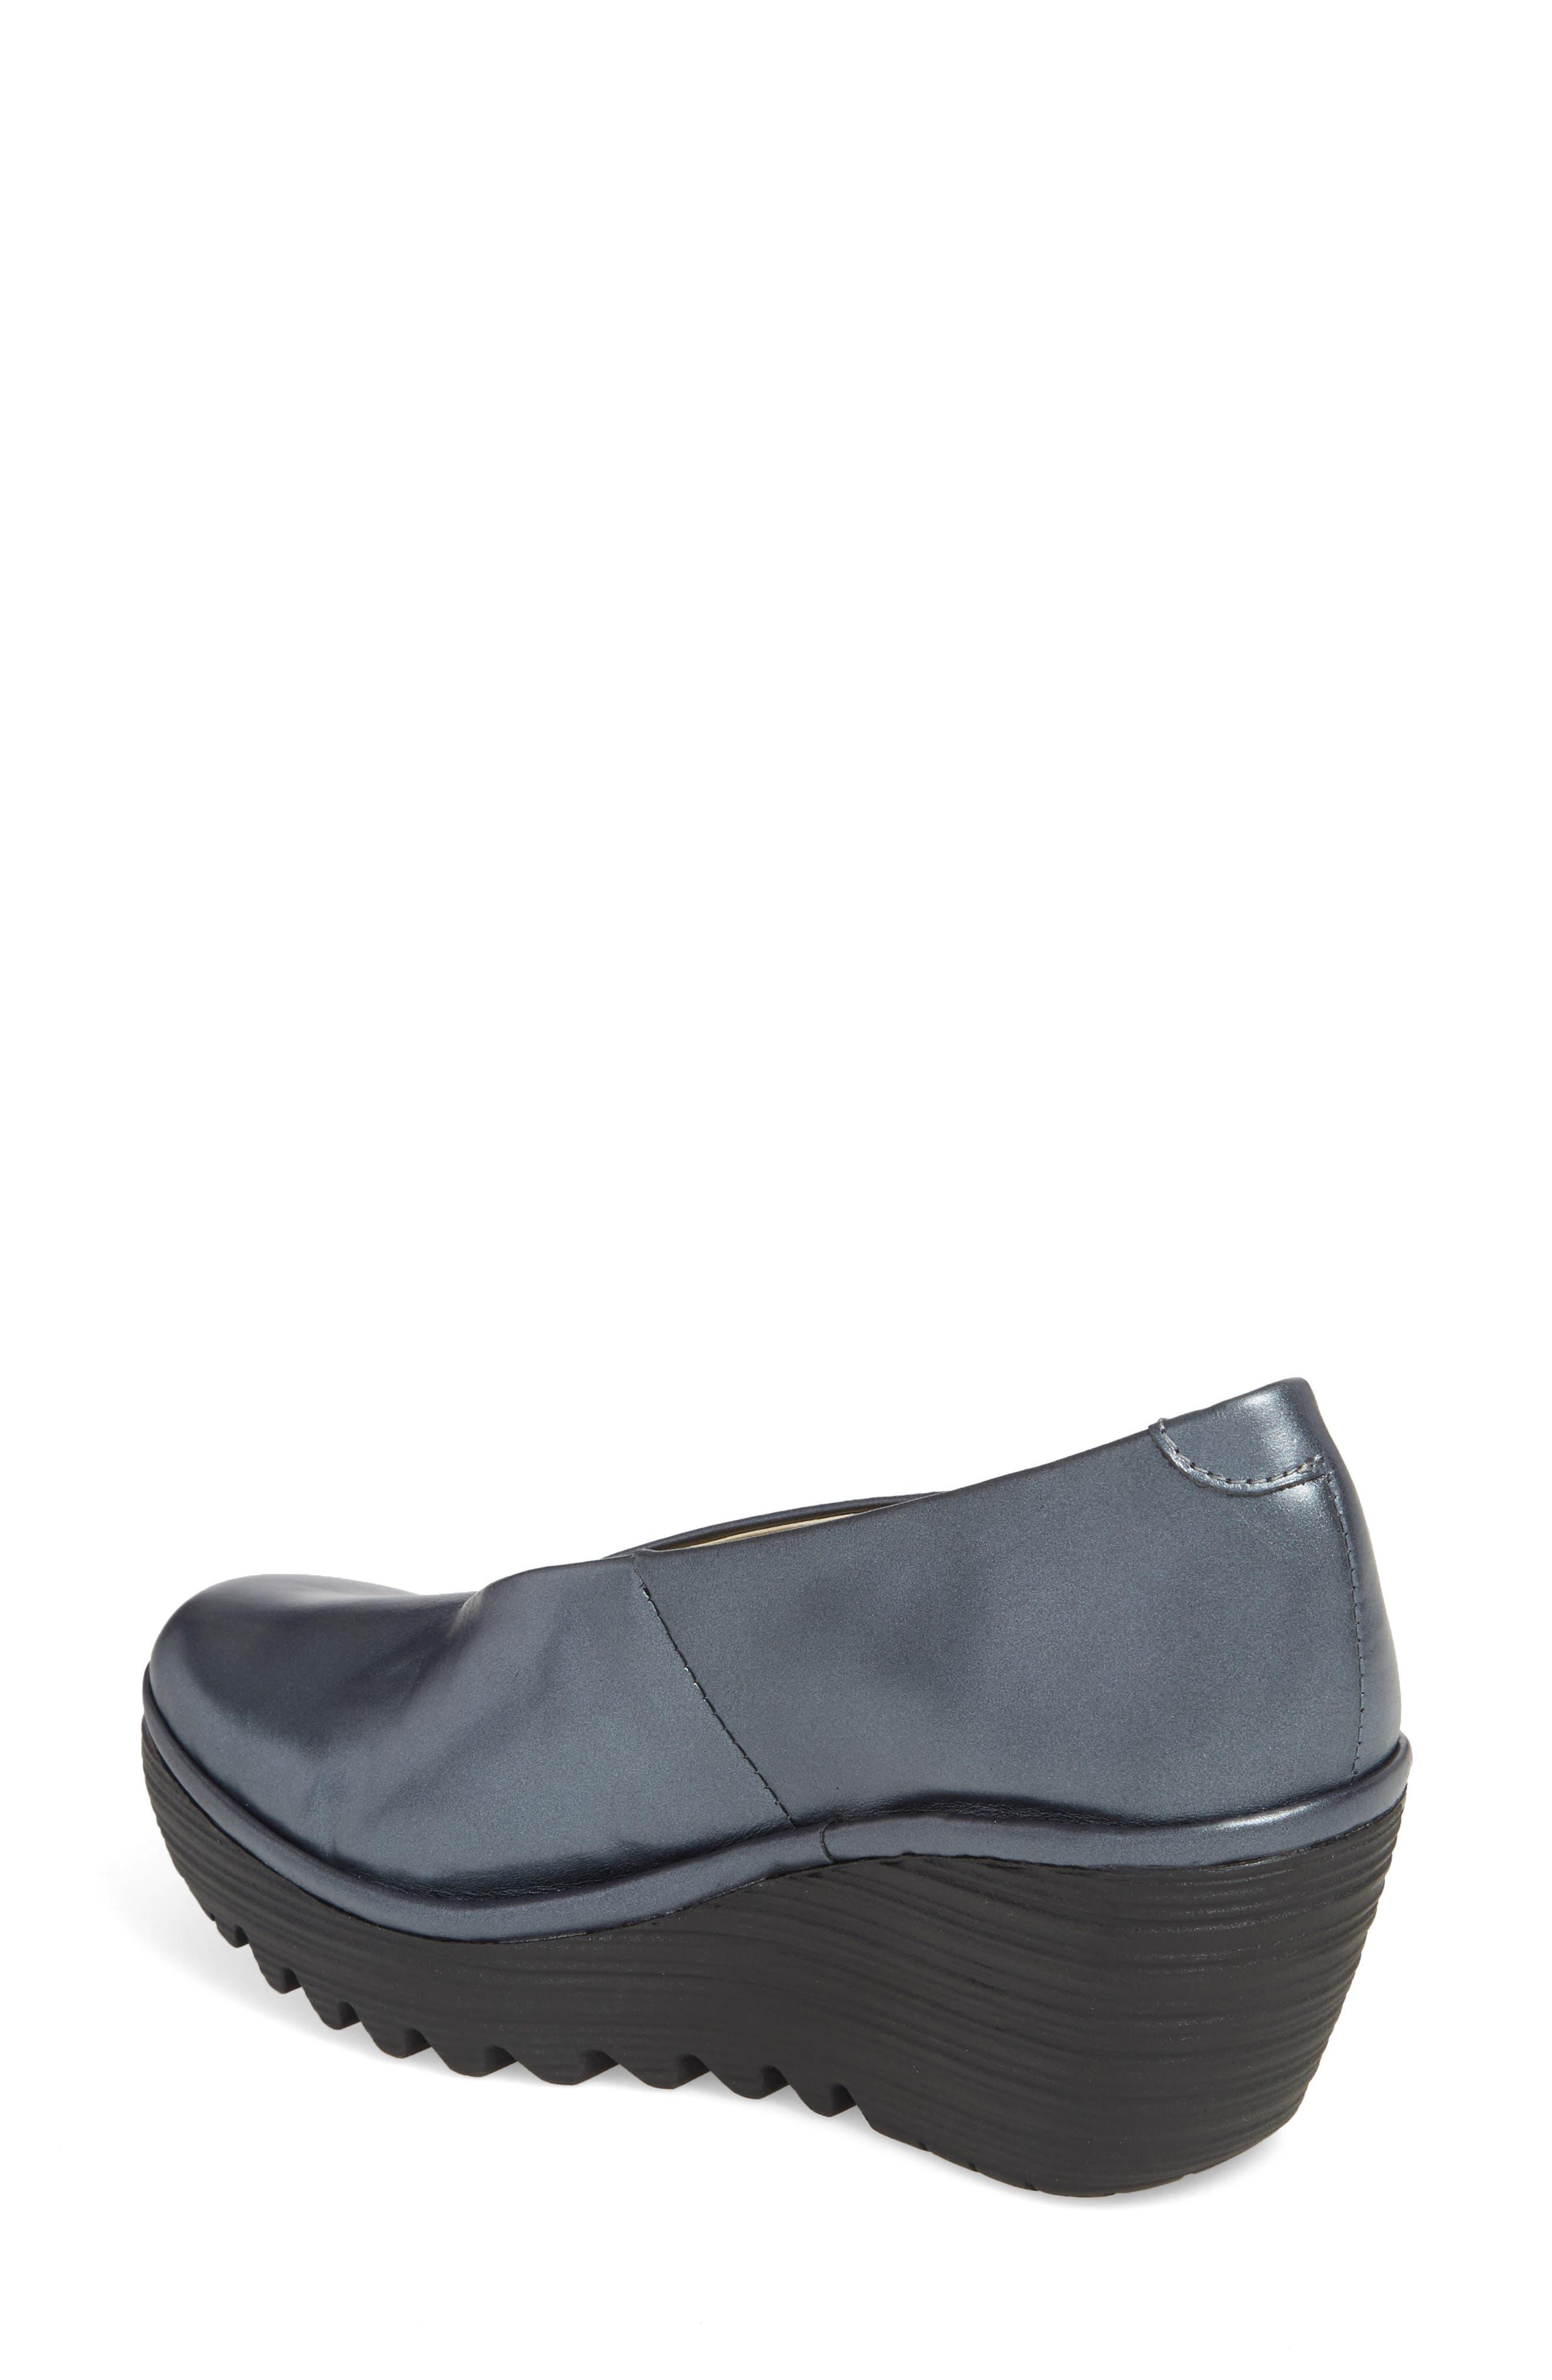 0b6c8b74a0d0 Women's Fly London Shoes | Nordstrom